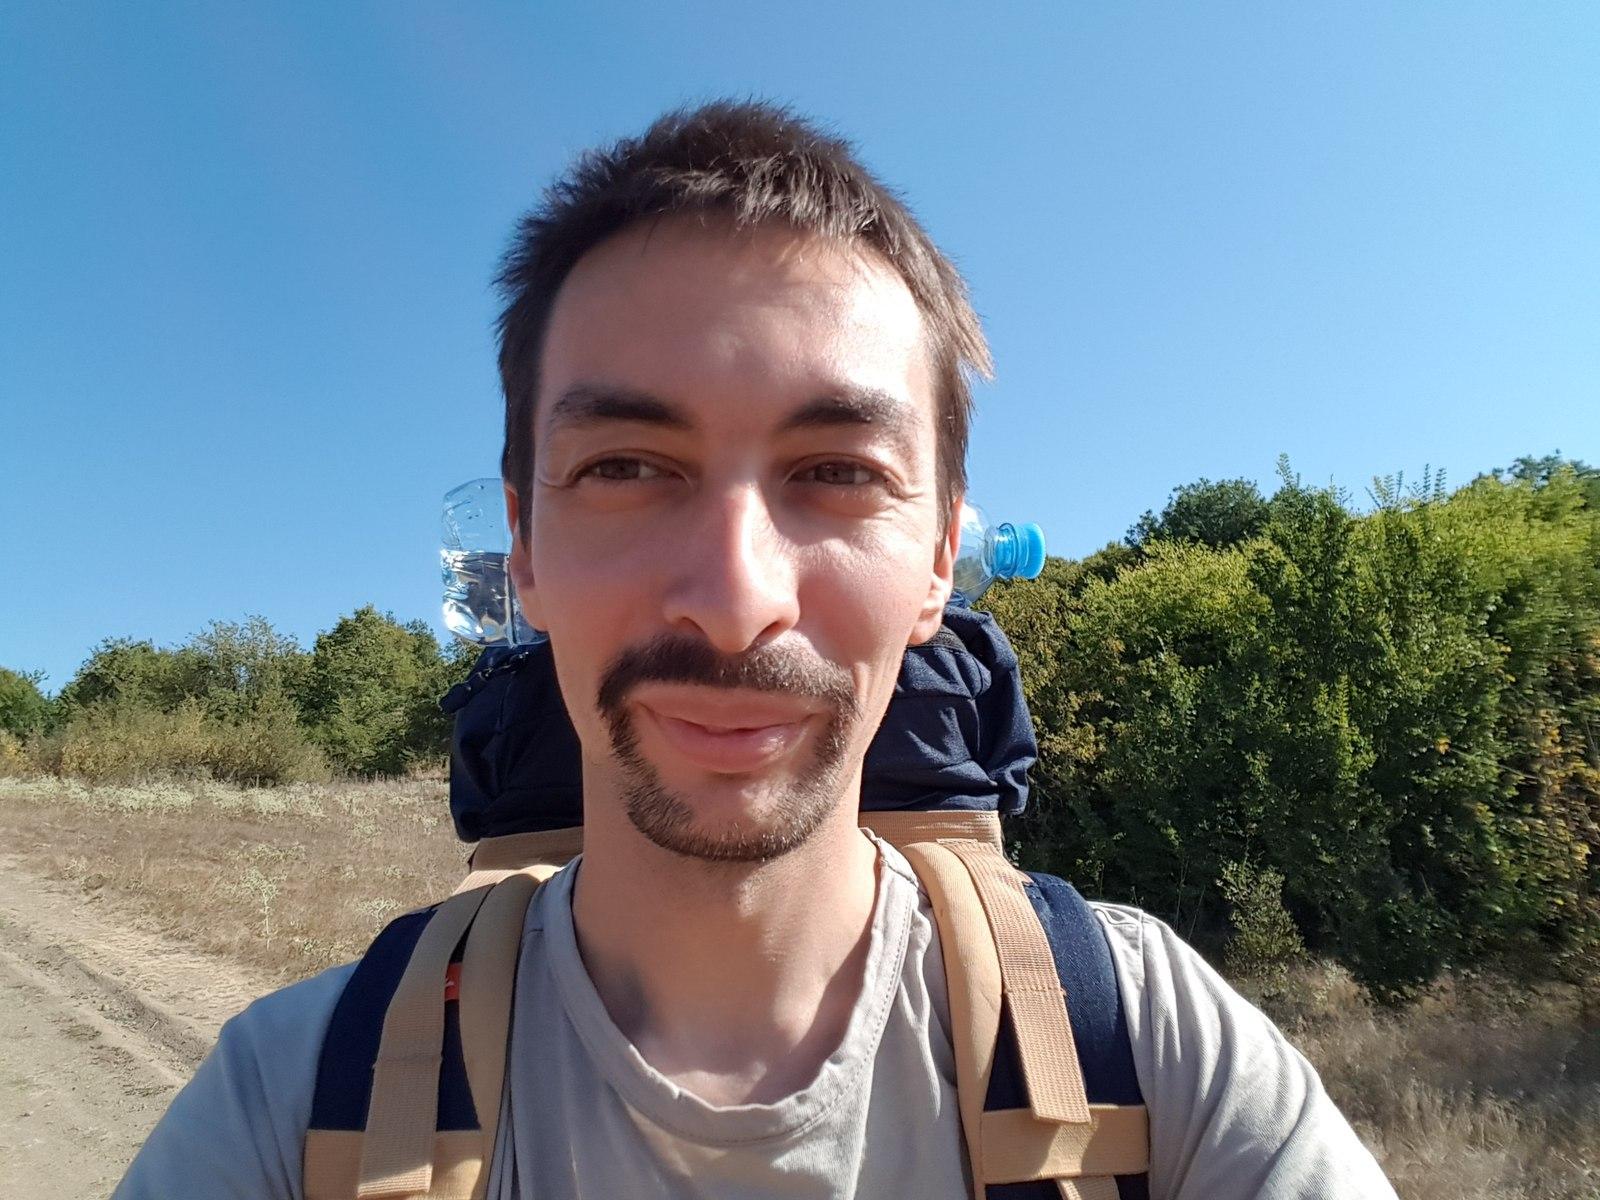 Знакомства в г.черноголовка знакомства с инвалидами с николаева